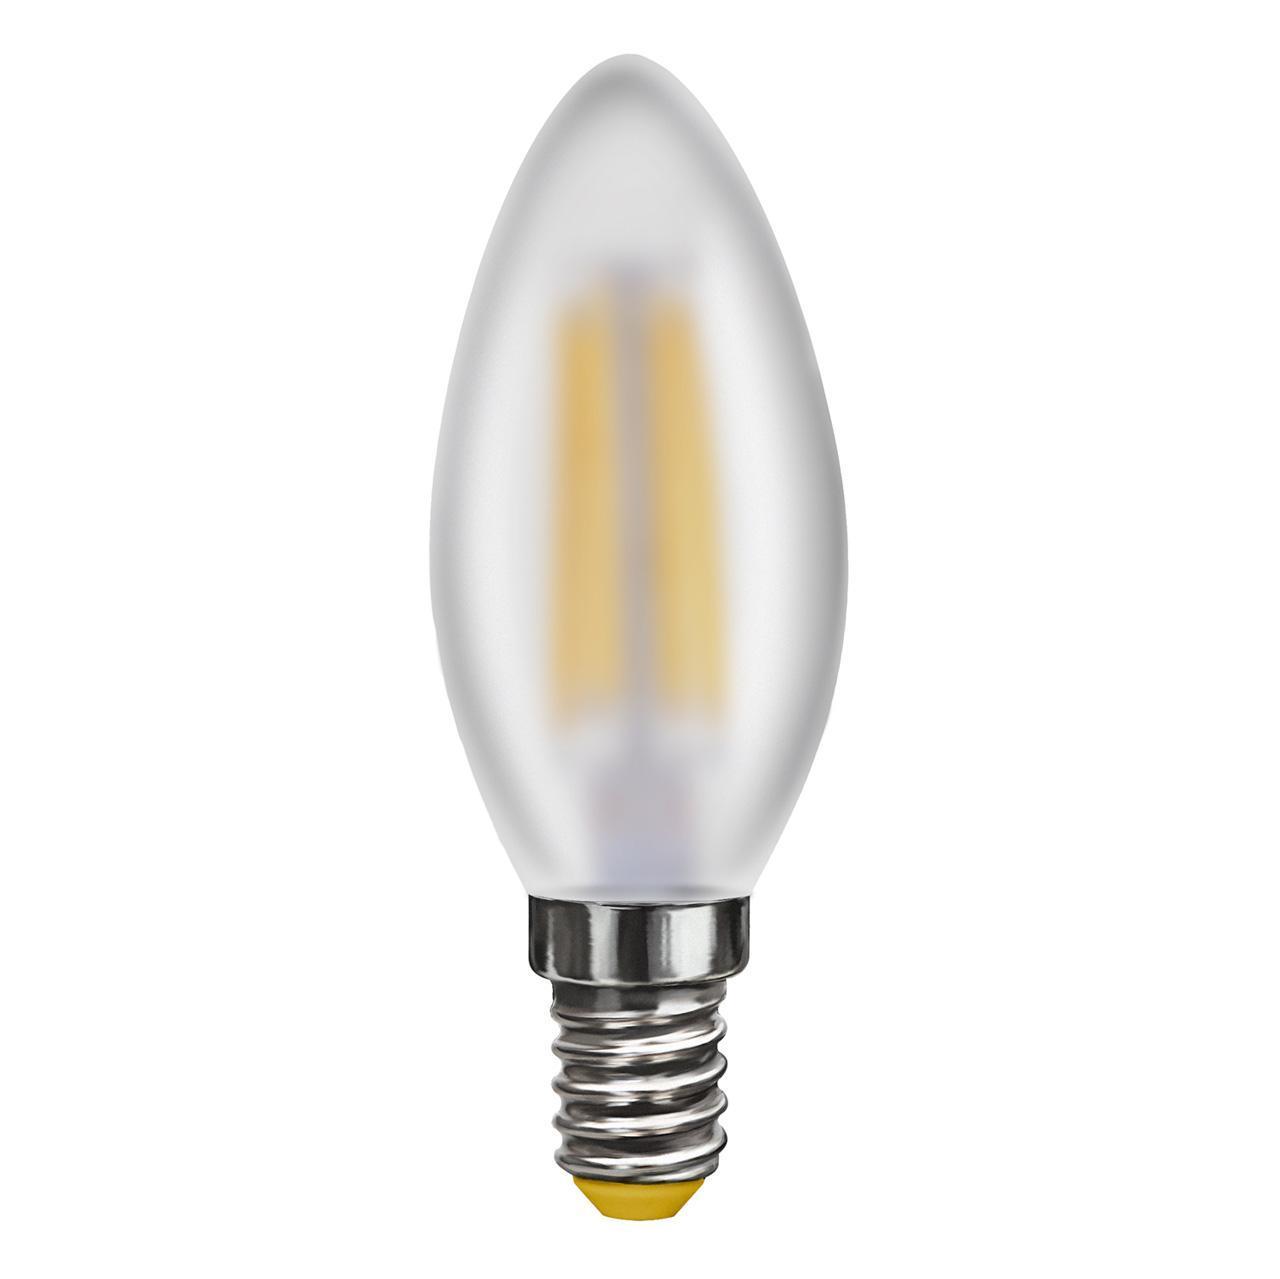 Лампа светодиодная E14 6W 2800K матовая VG10-C2E14warm6W-F 7044 voltega лампа светодиодная voltega свеча на ветру прозрачная e14 6w 2800k vg10 cw1e14warm6w f 7017